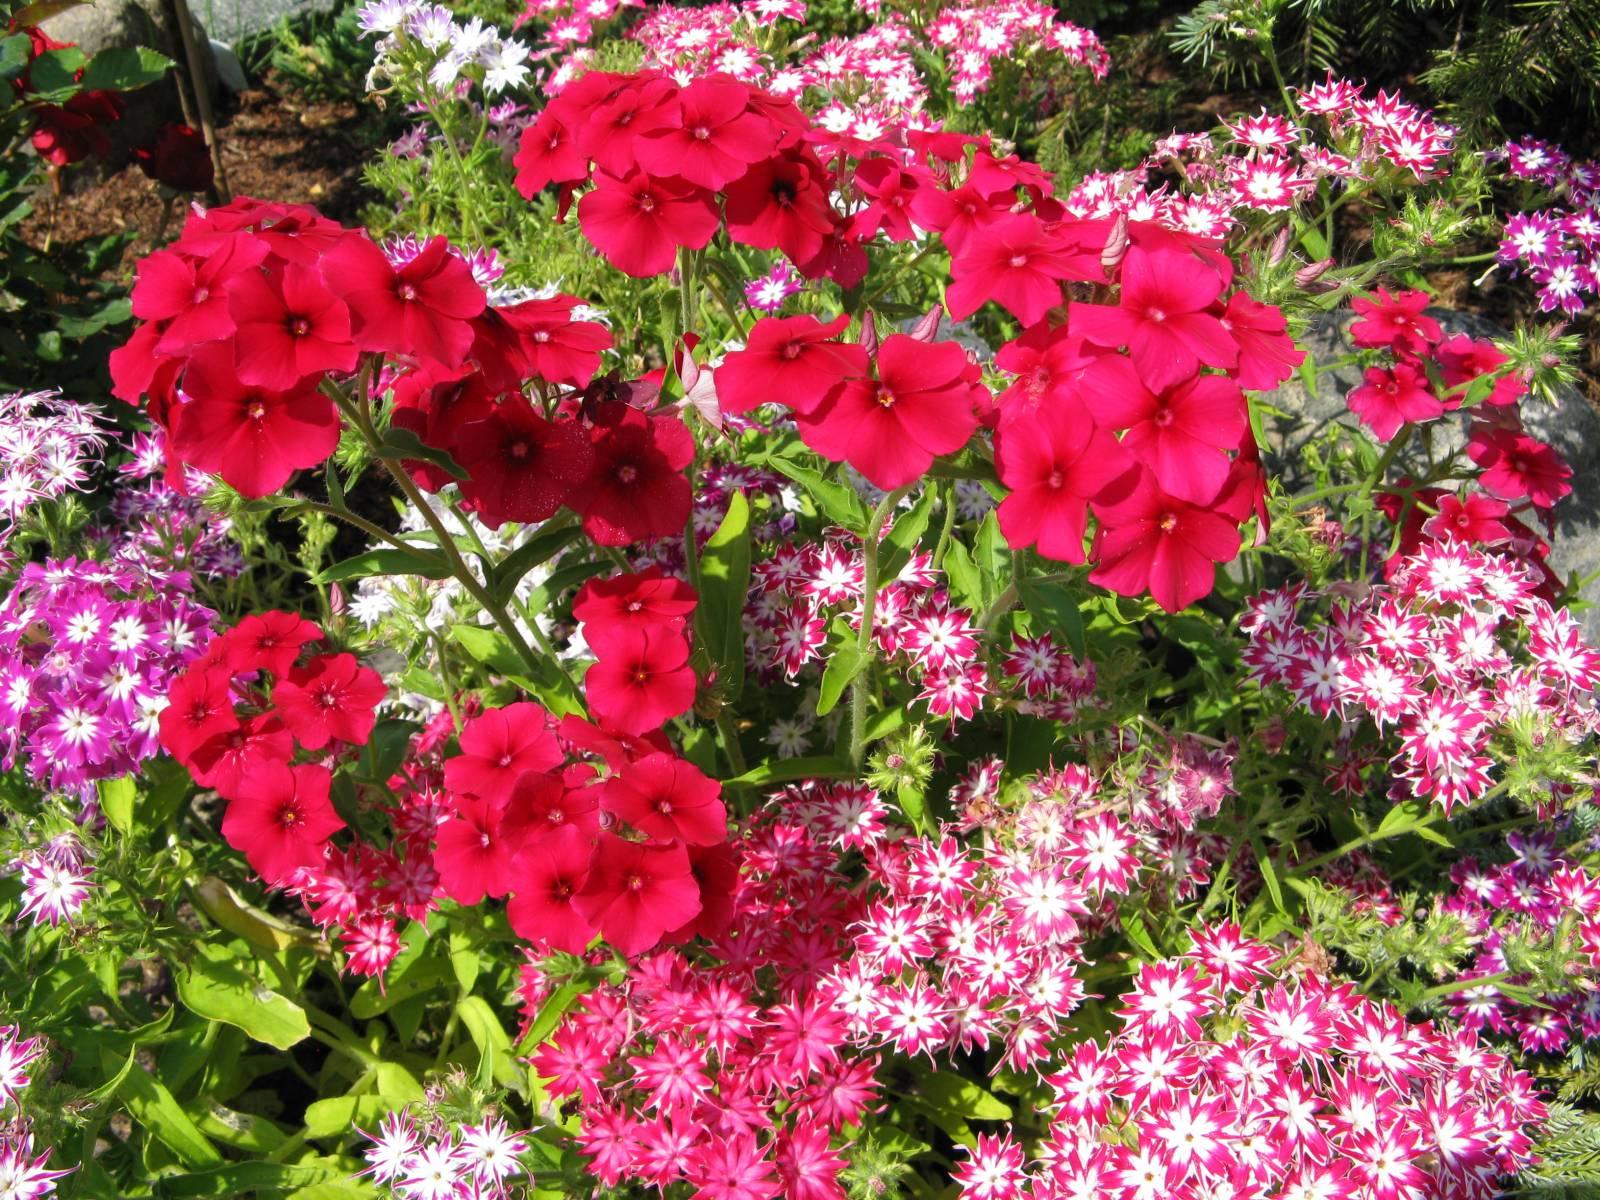 Цветы флокс друммонда фото описание